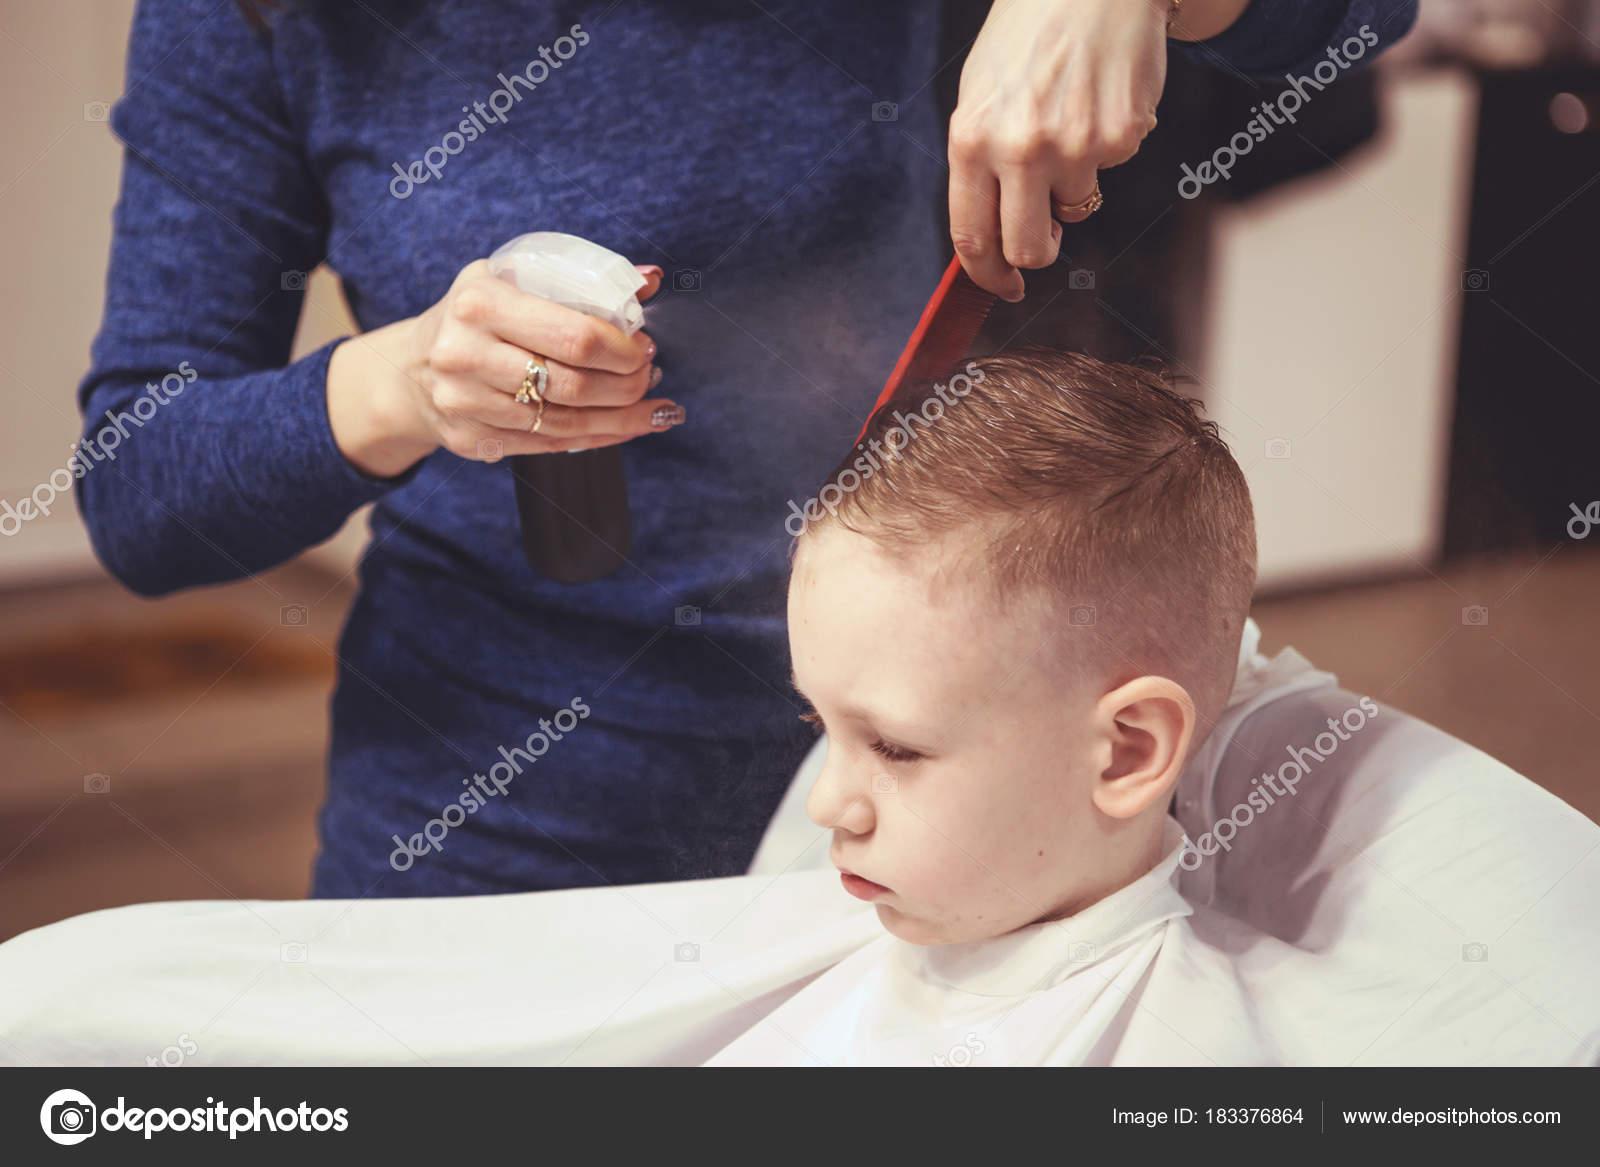 Стрижка волос мальчику ребенку фото